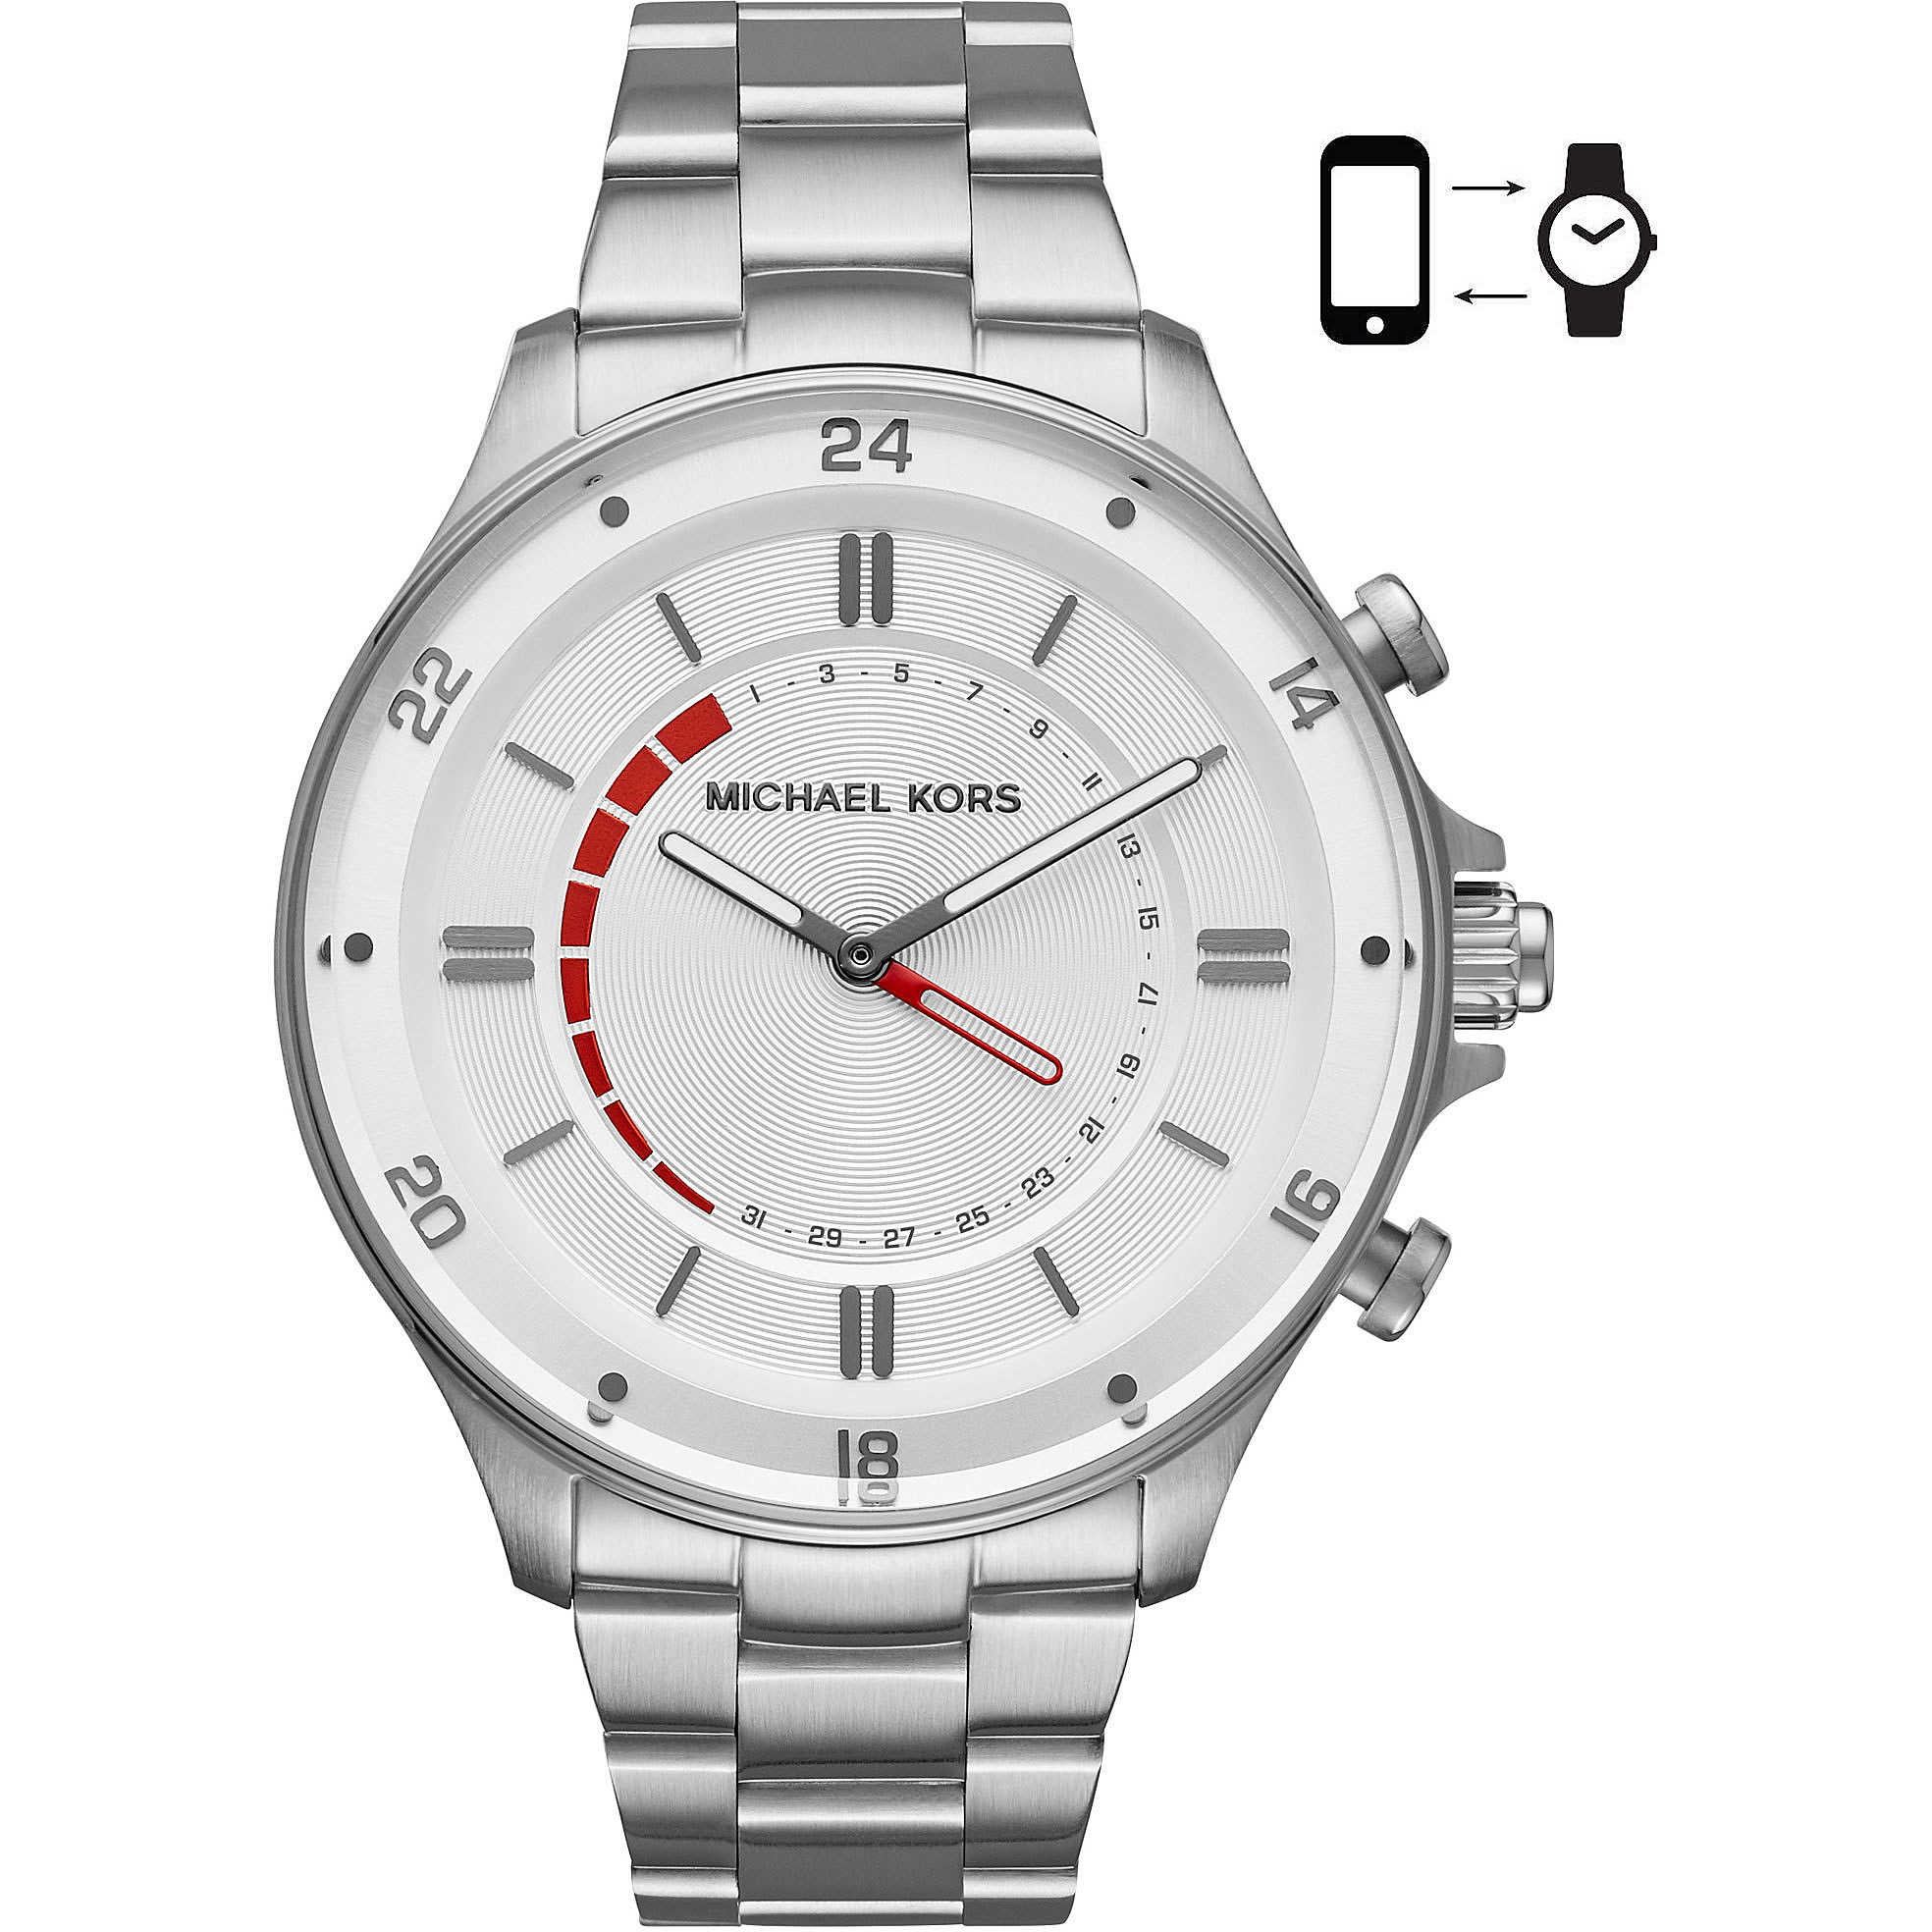 aa78e31a64976 orologio Smartwatch uomo Michael Kors Reid MKT4013 Smartwatches ...